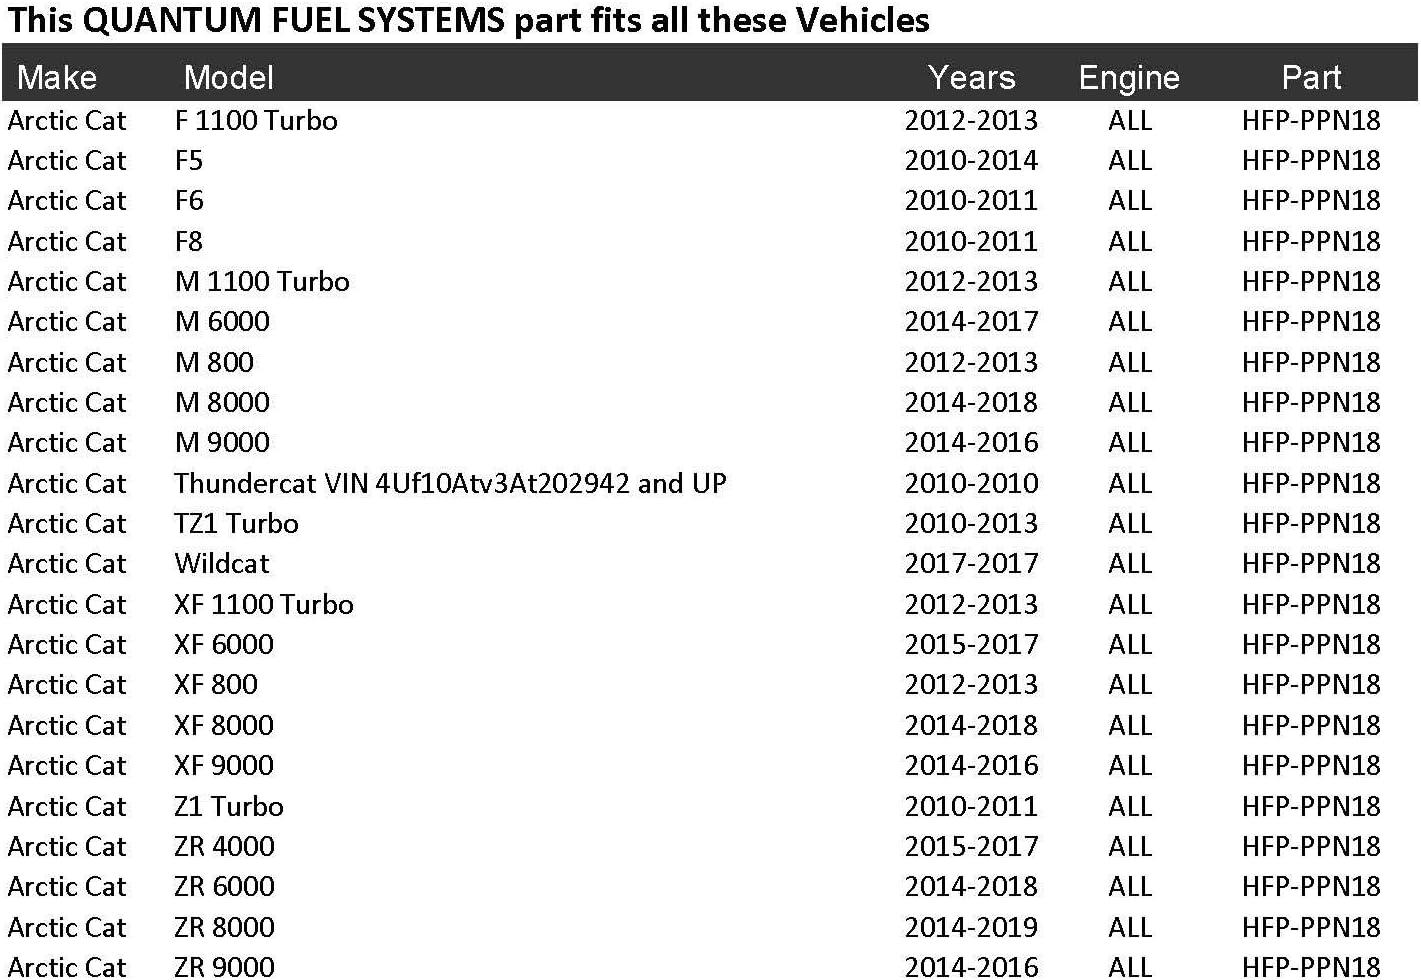 HFP-PPN18 Arc XF 6009 800 9000 1100 Turbo//ZR 4000 6000 8000 9000 Z1 Turbo 2010-2019 Snowmobile Genuine Original Equipment OEM Fuel Pump with Strainer